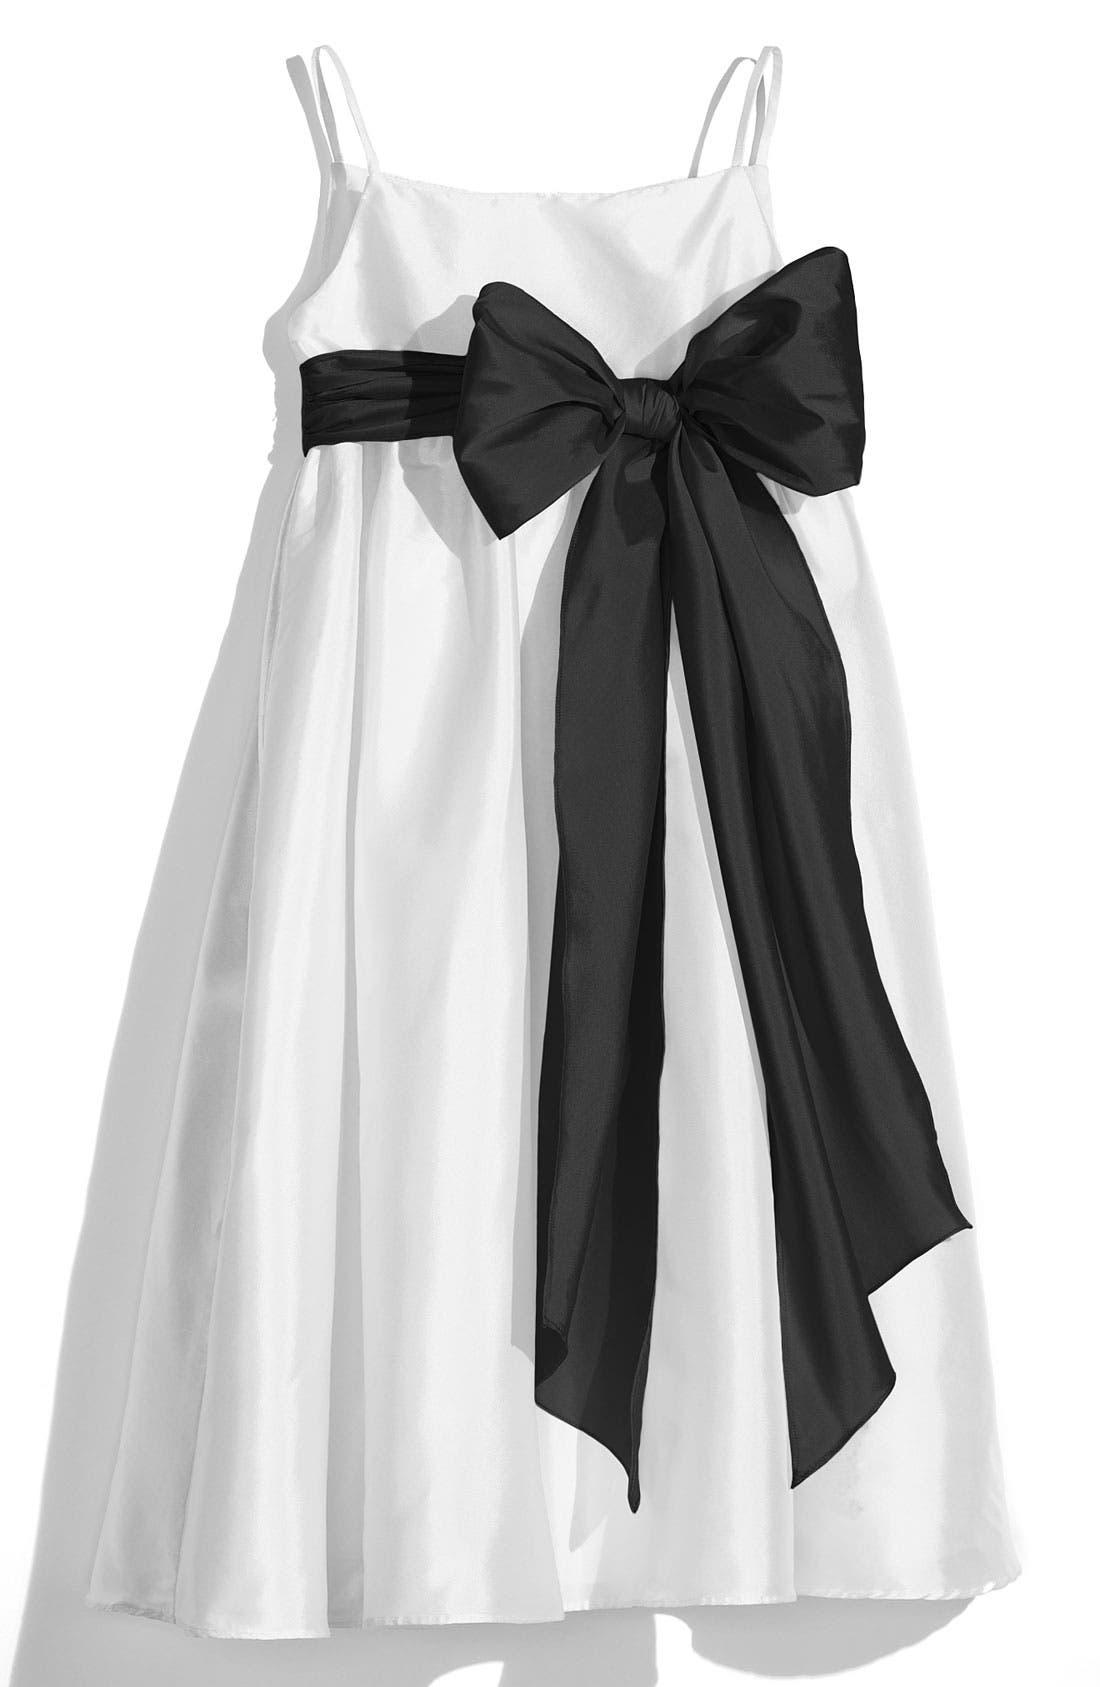 White Sleeveless Empire Waist Taffeta Dress,                         Main,                         color, 001